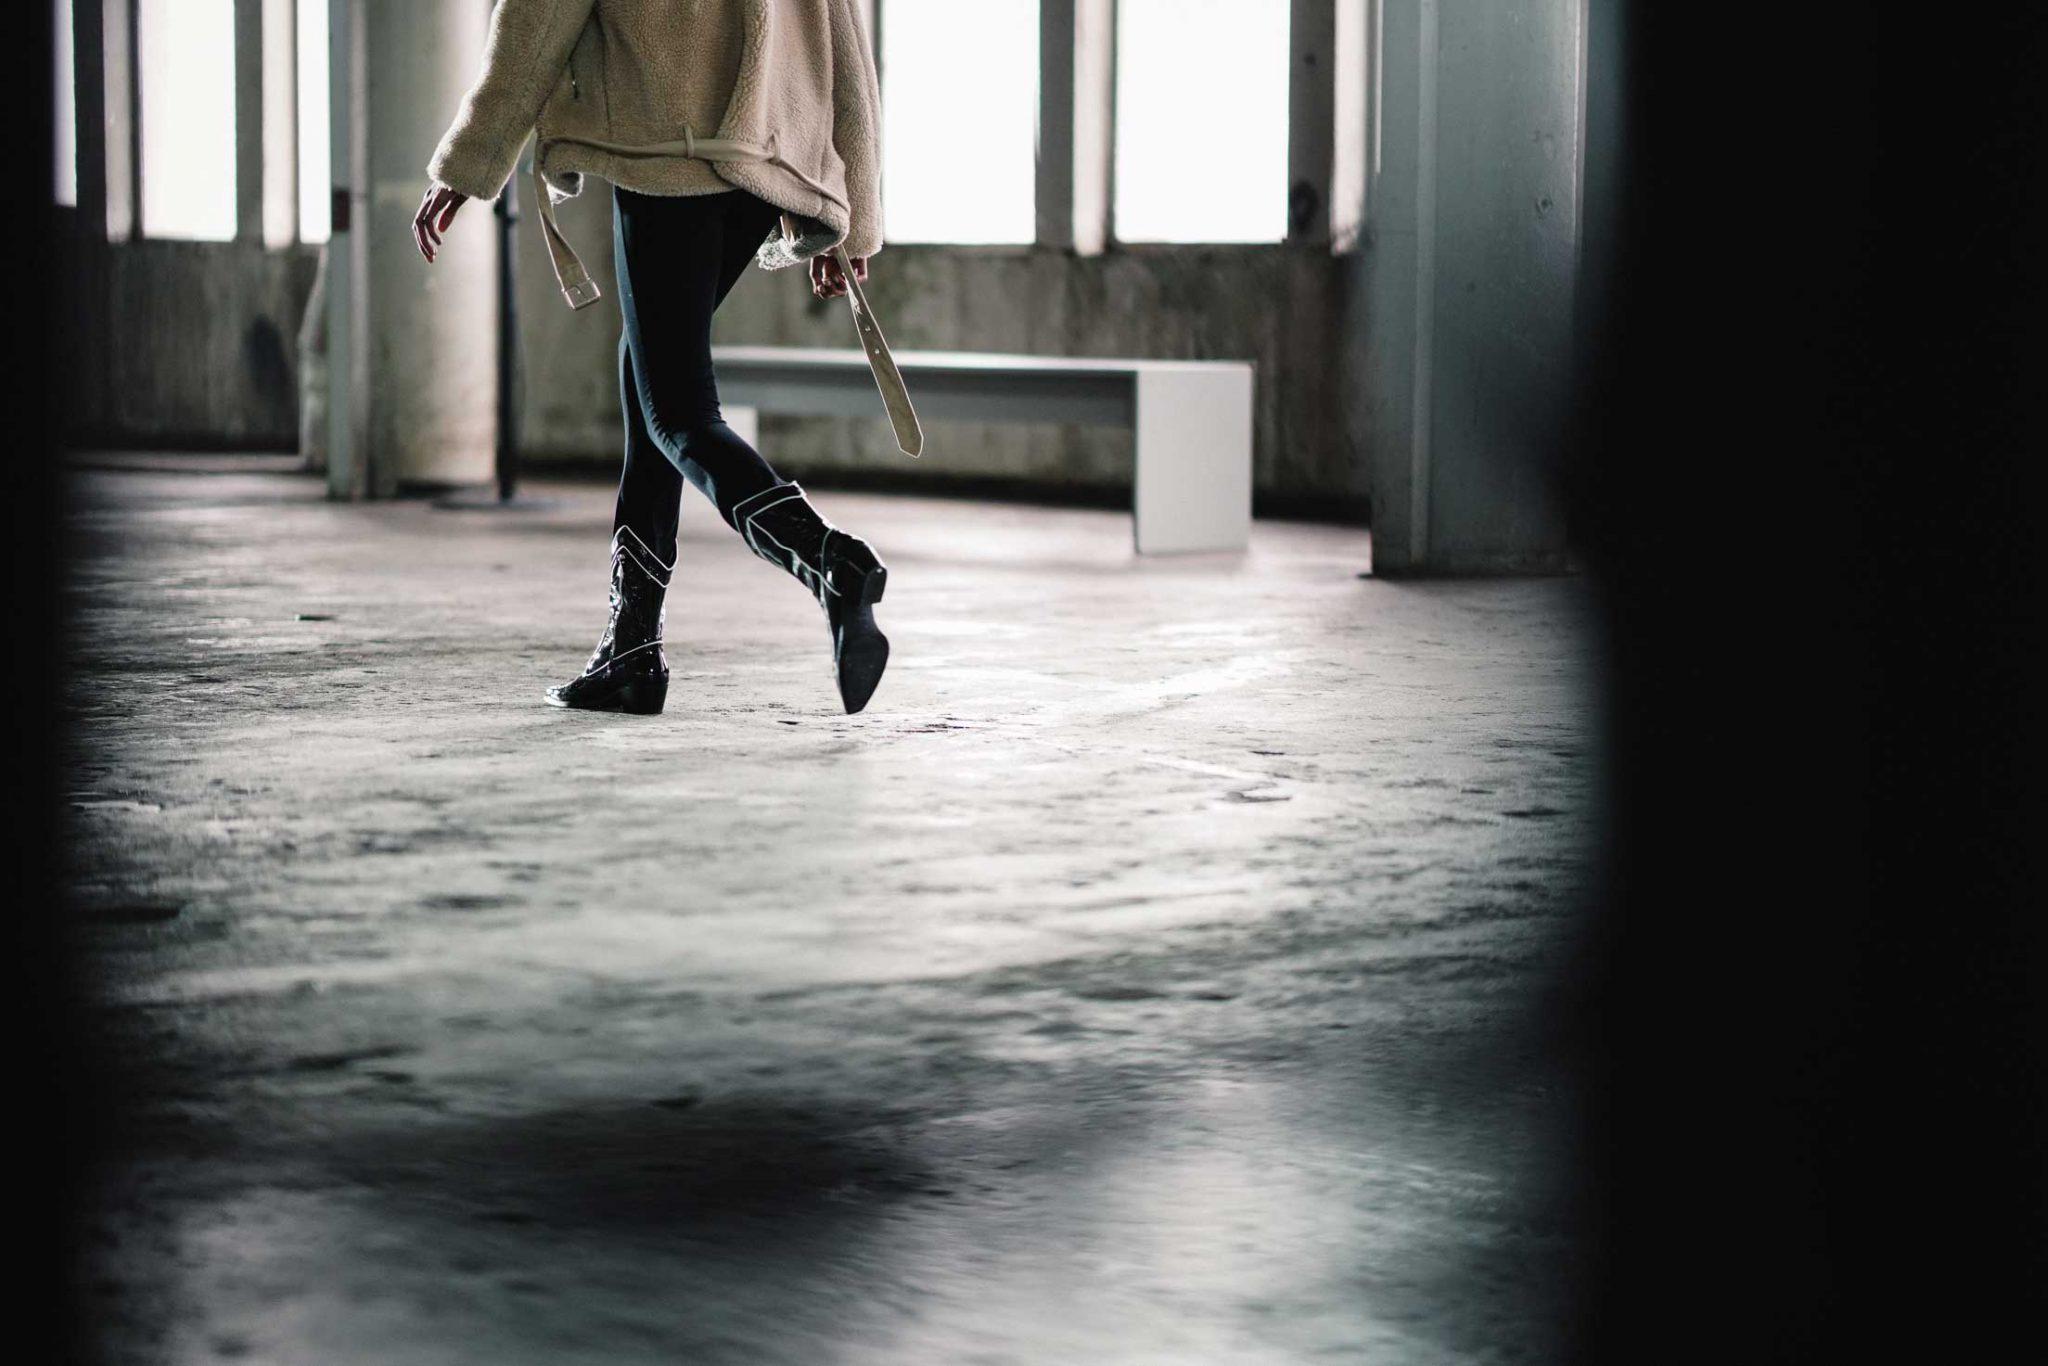 Ilsoo_van_Dijk_Ilsoovandijk_AFW_Toral_Backstage_Amsterdam_Fashion_week_2020_-scaled_5